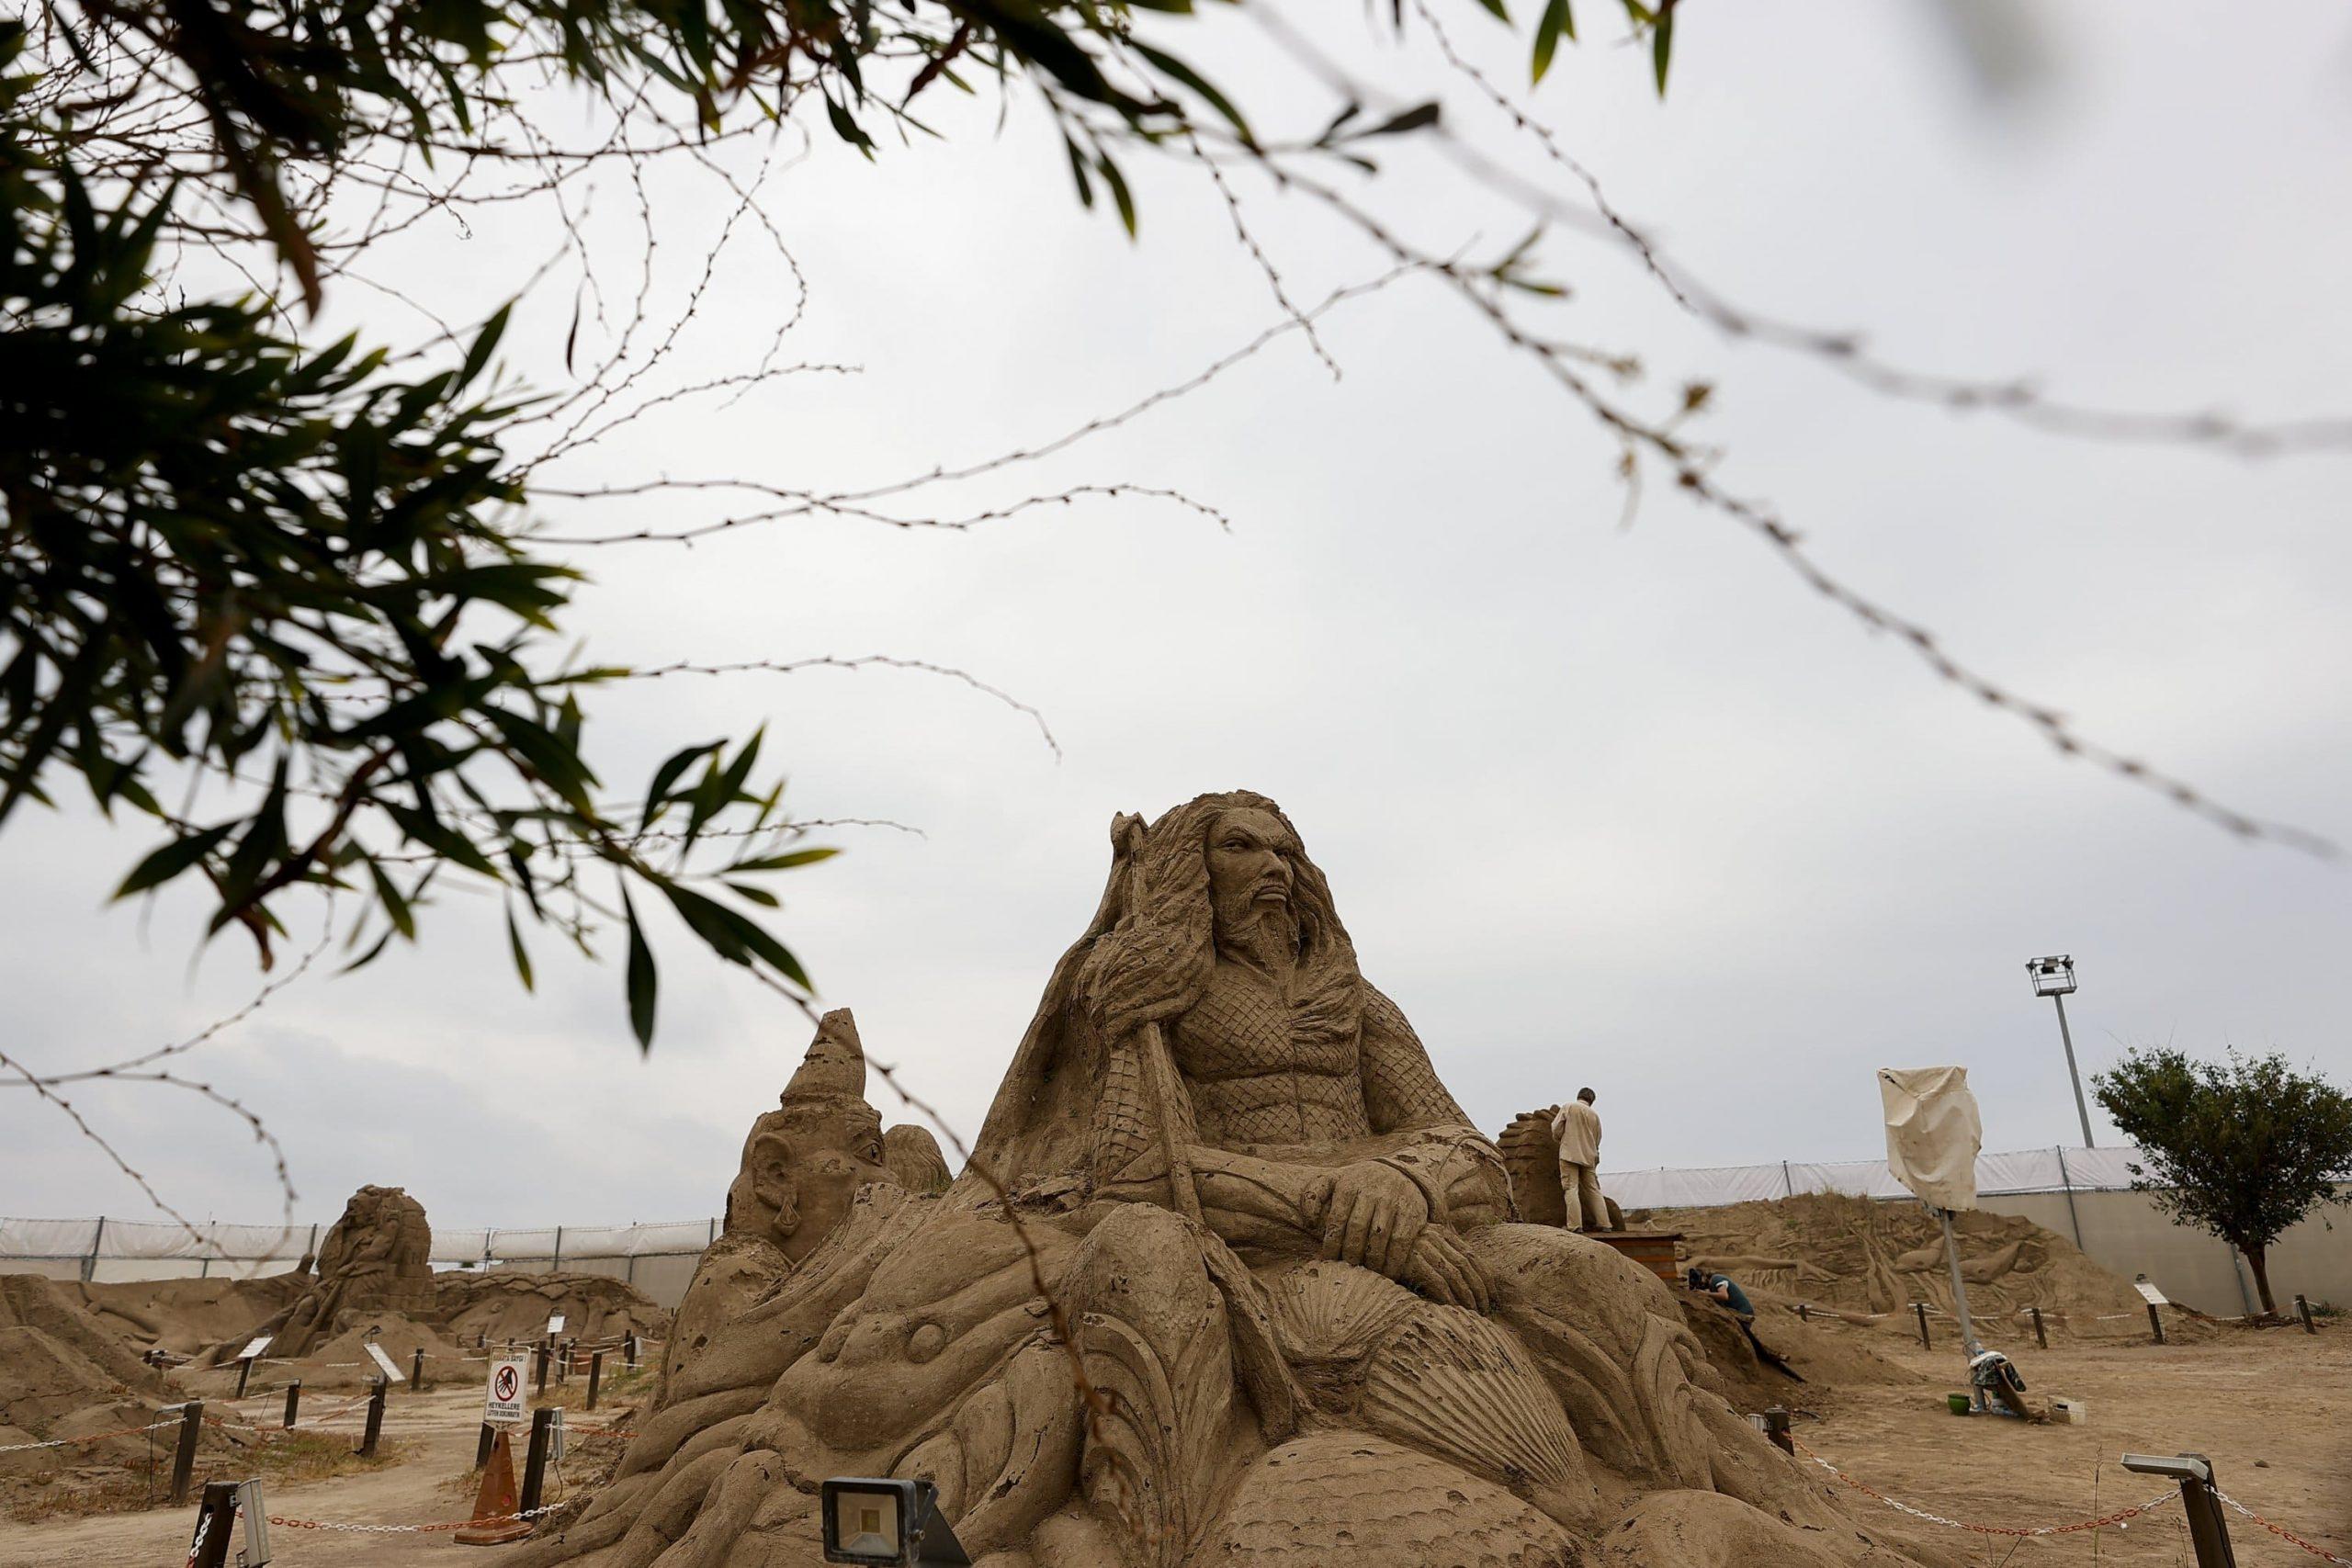 sand sculptor festival